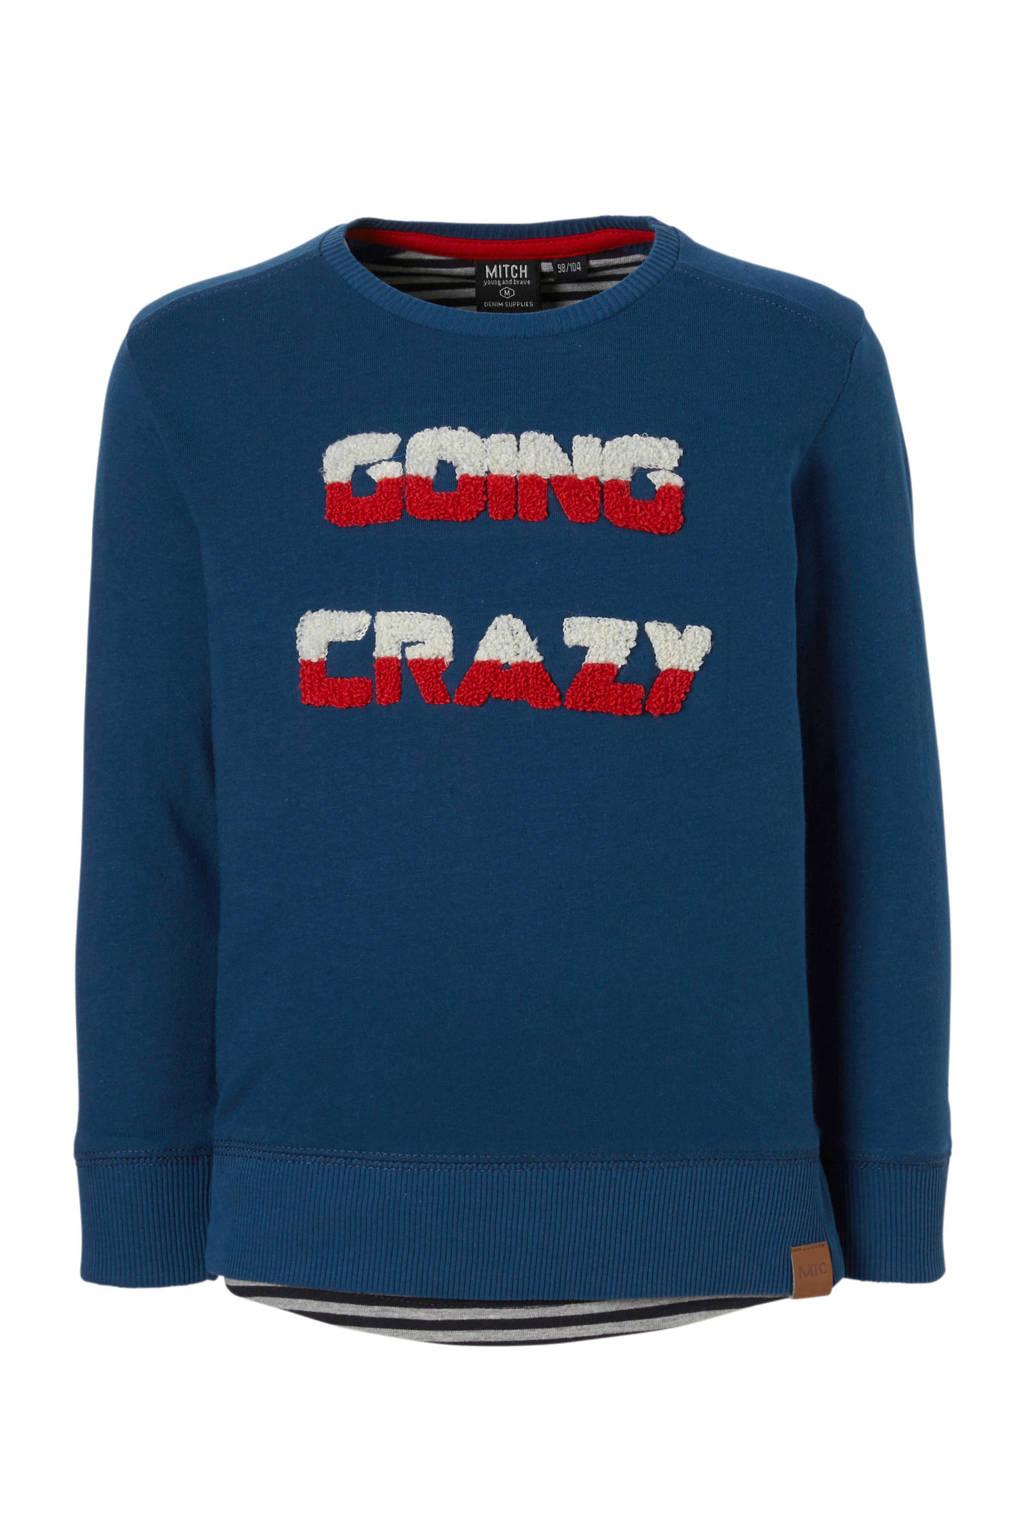 Mitch sweater Fabo met tekst blauw, Blauw/wit/rood